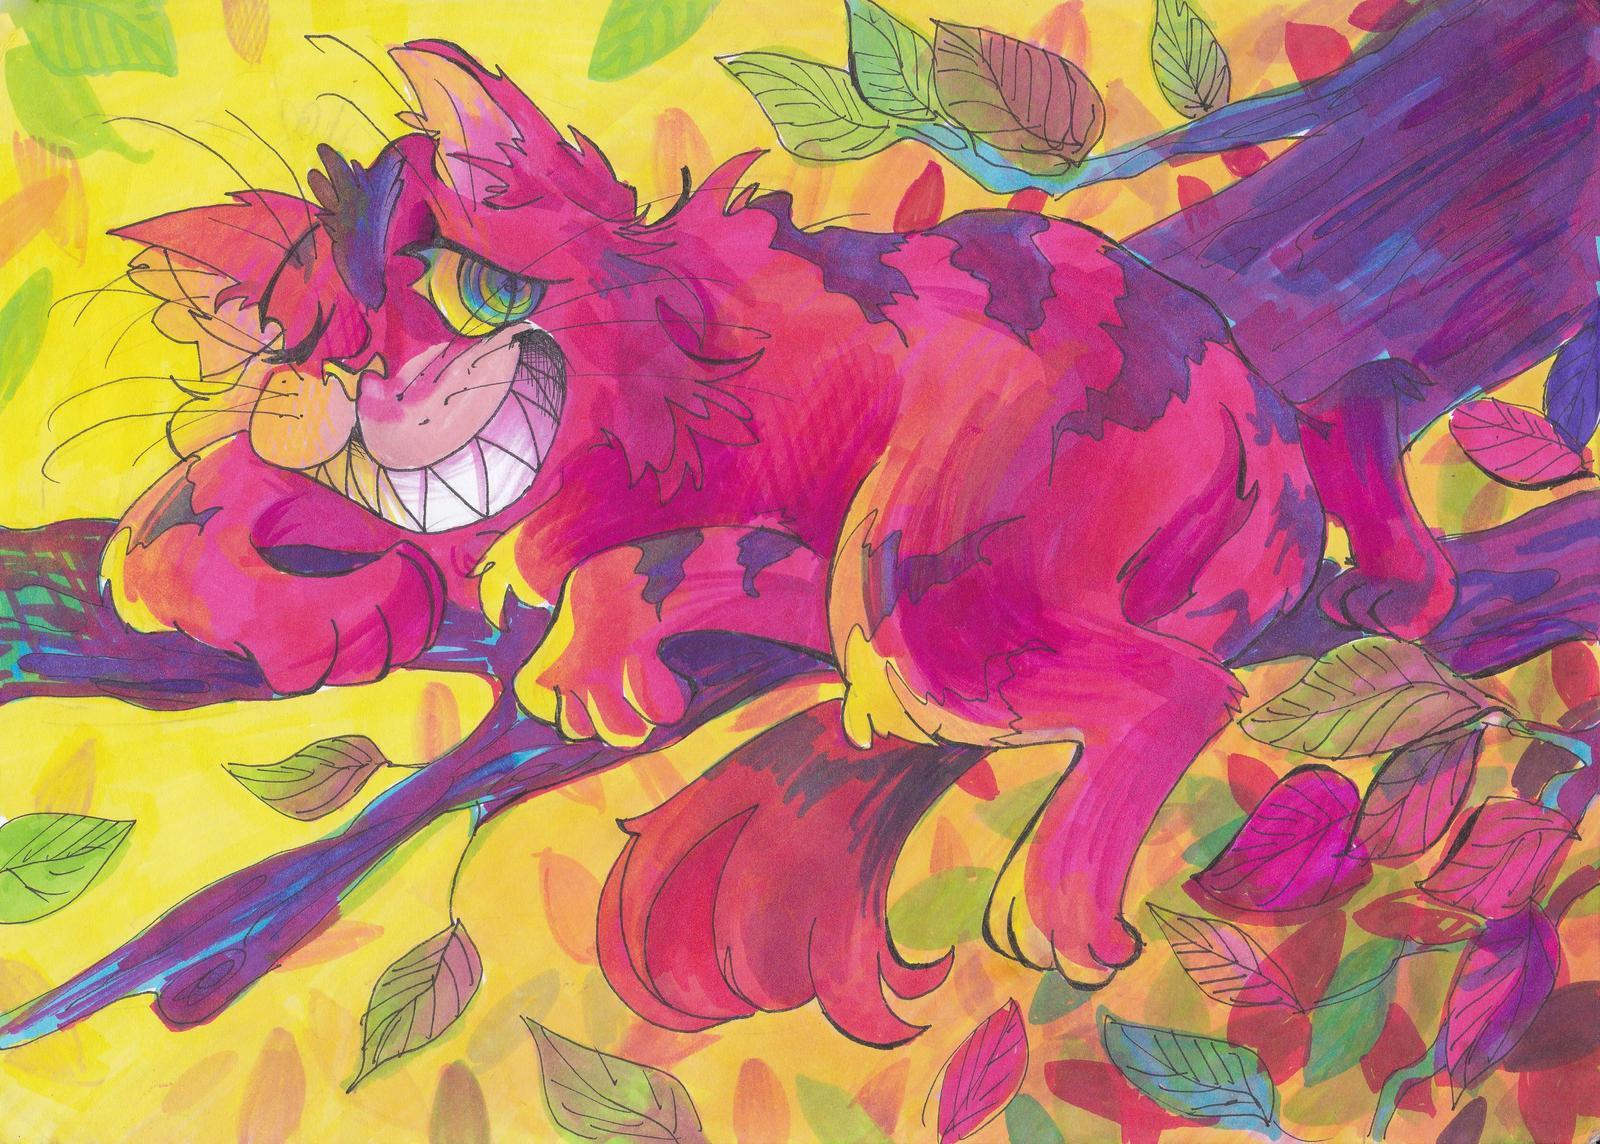 Cheshire Cat by Selebushka